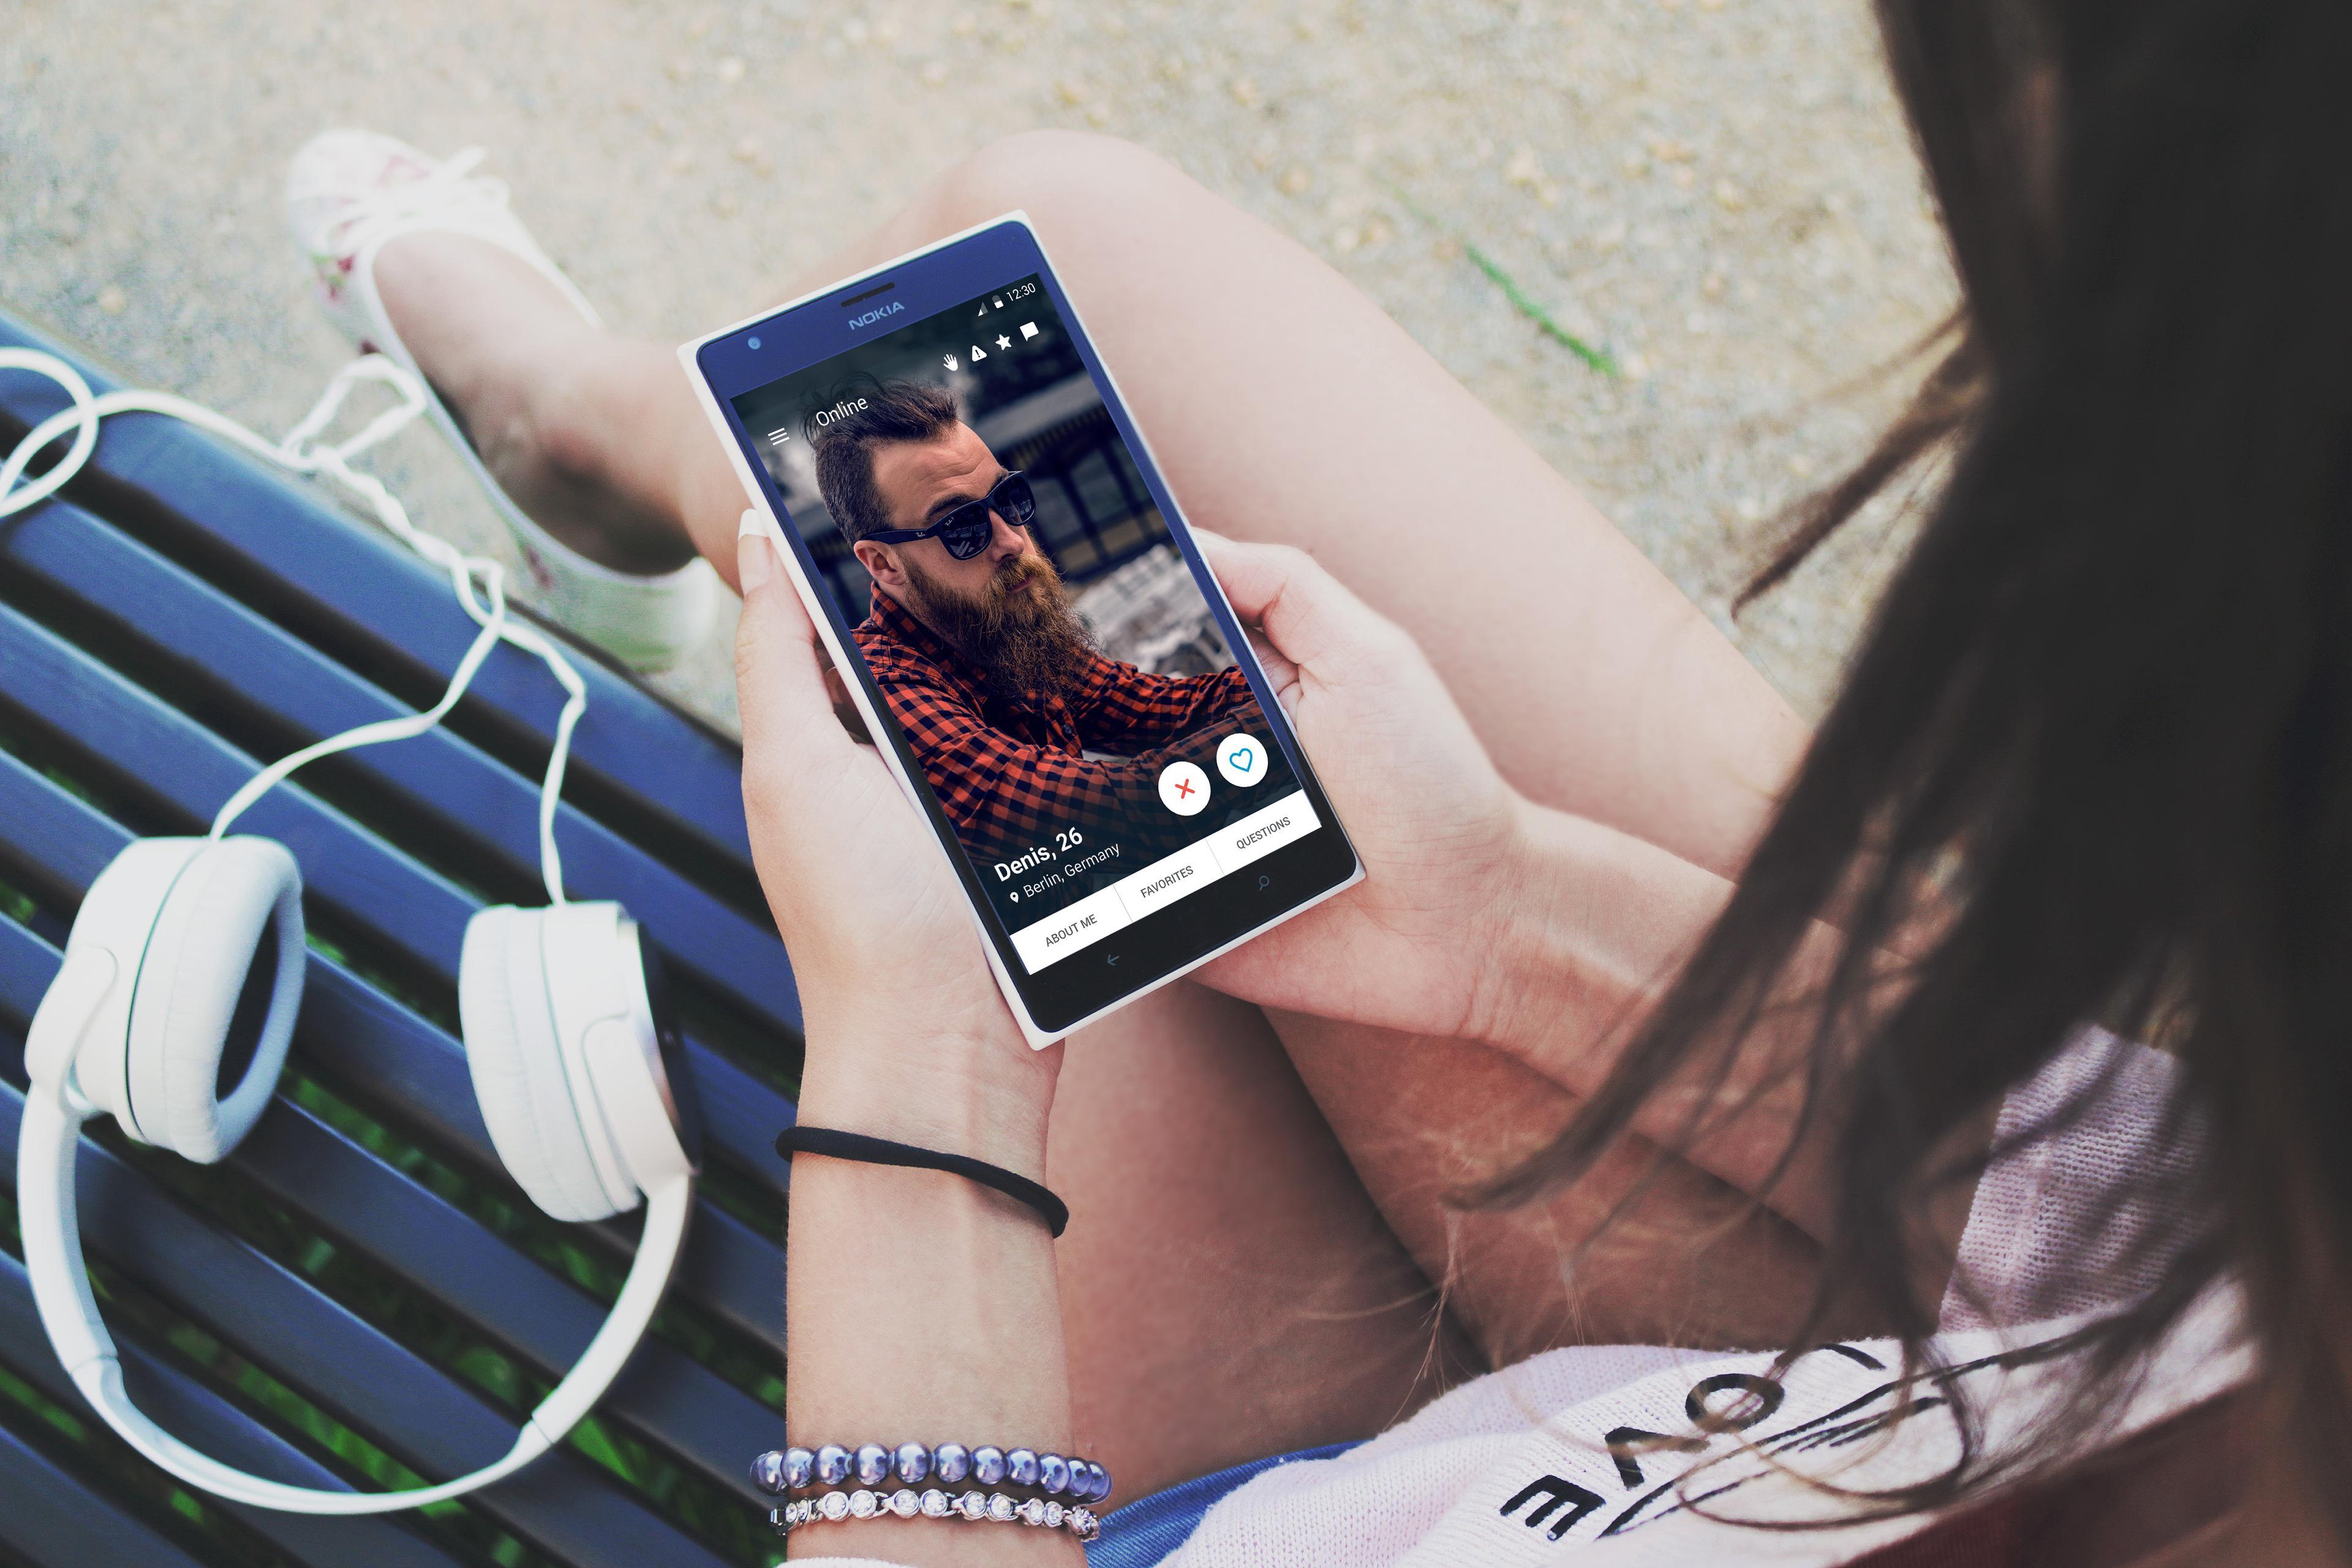 flirtbox dating siteBengali online dating